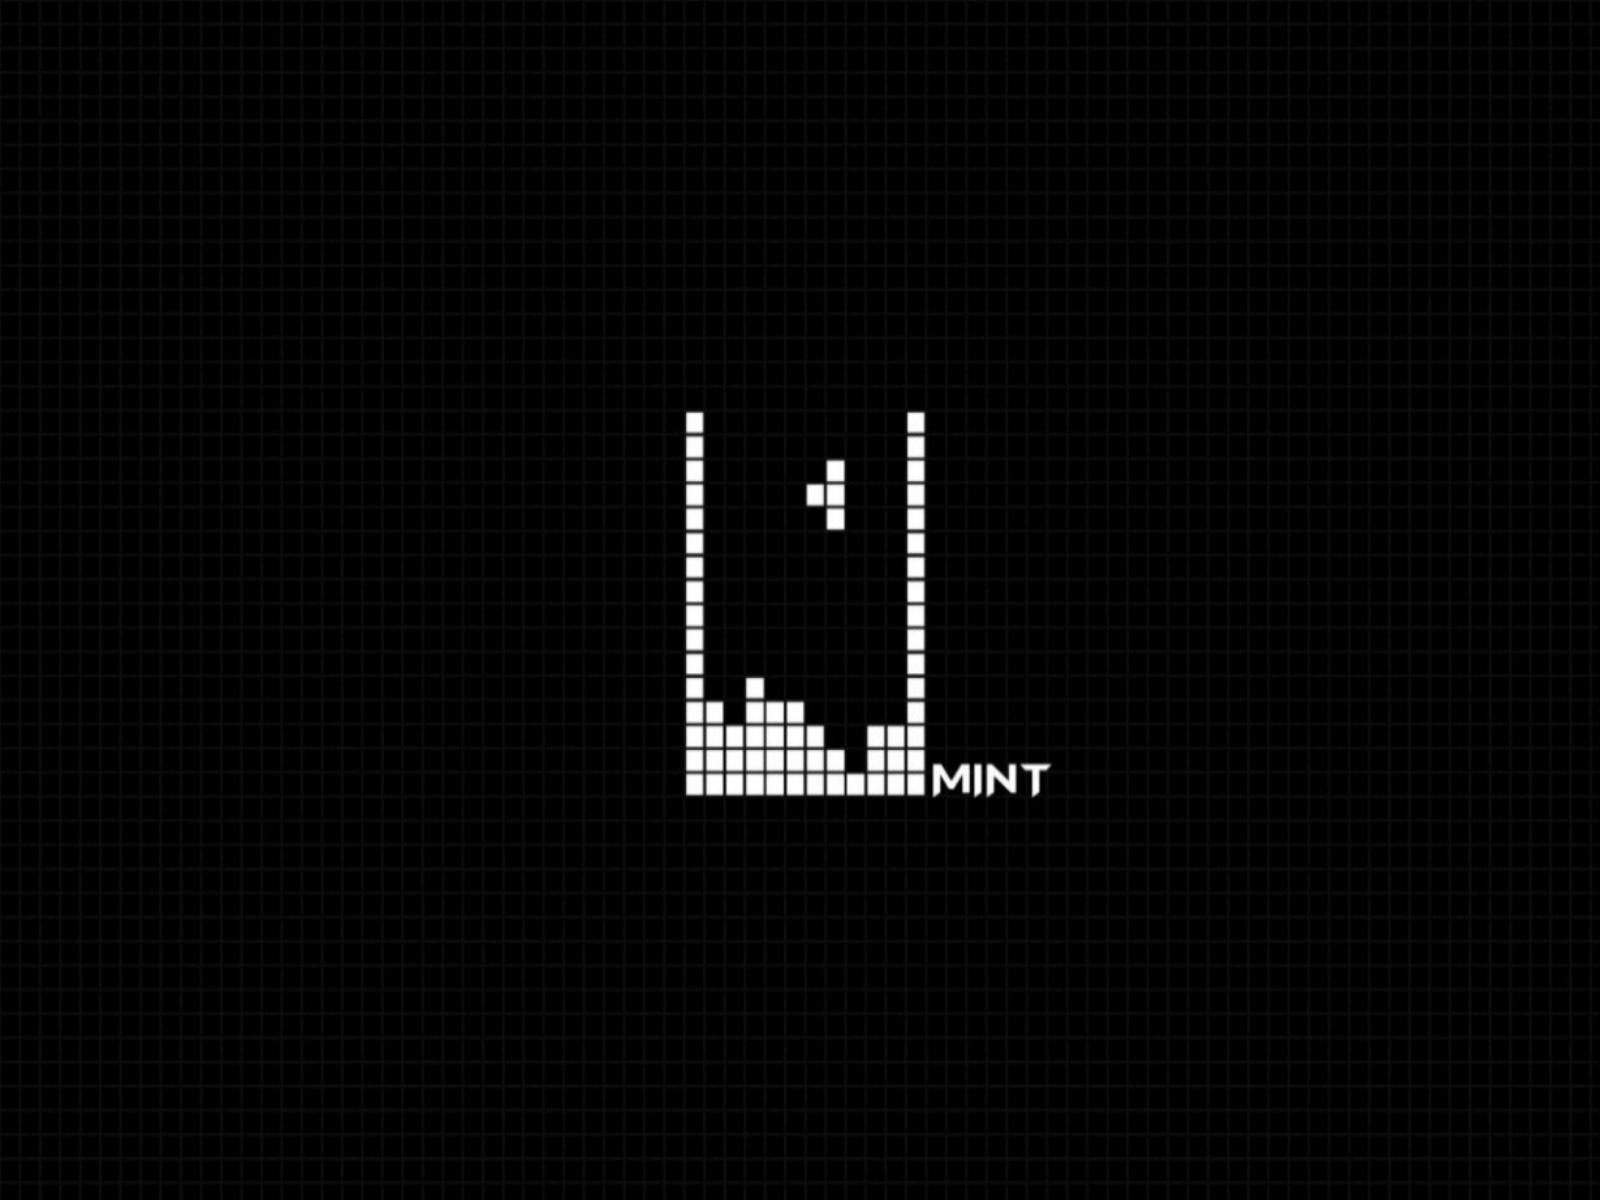 Mint Linux Games Wallpapers Linux Mint Pictures Mint Background 1600x1200